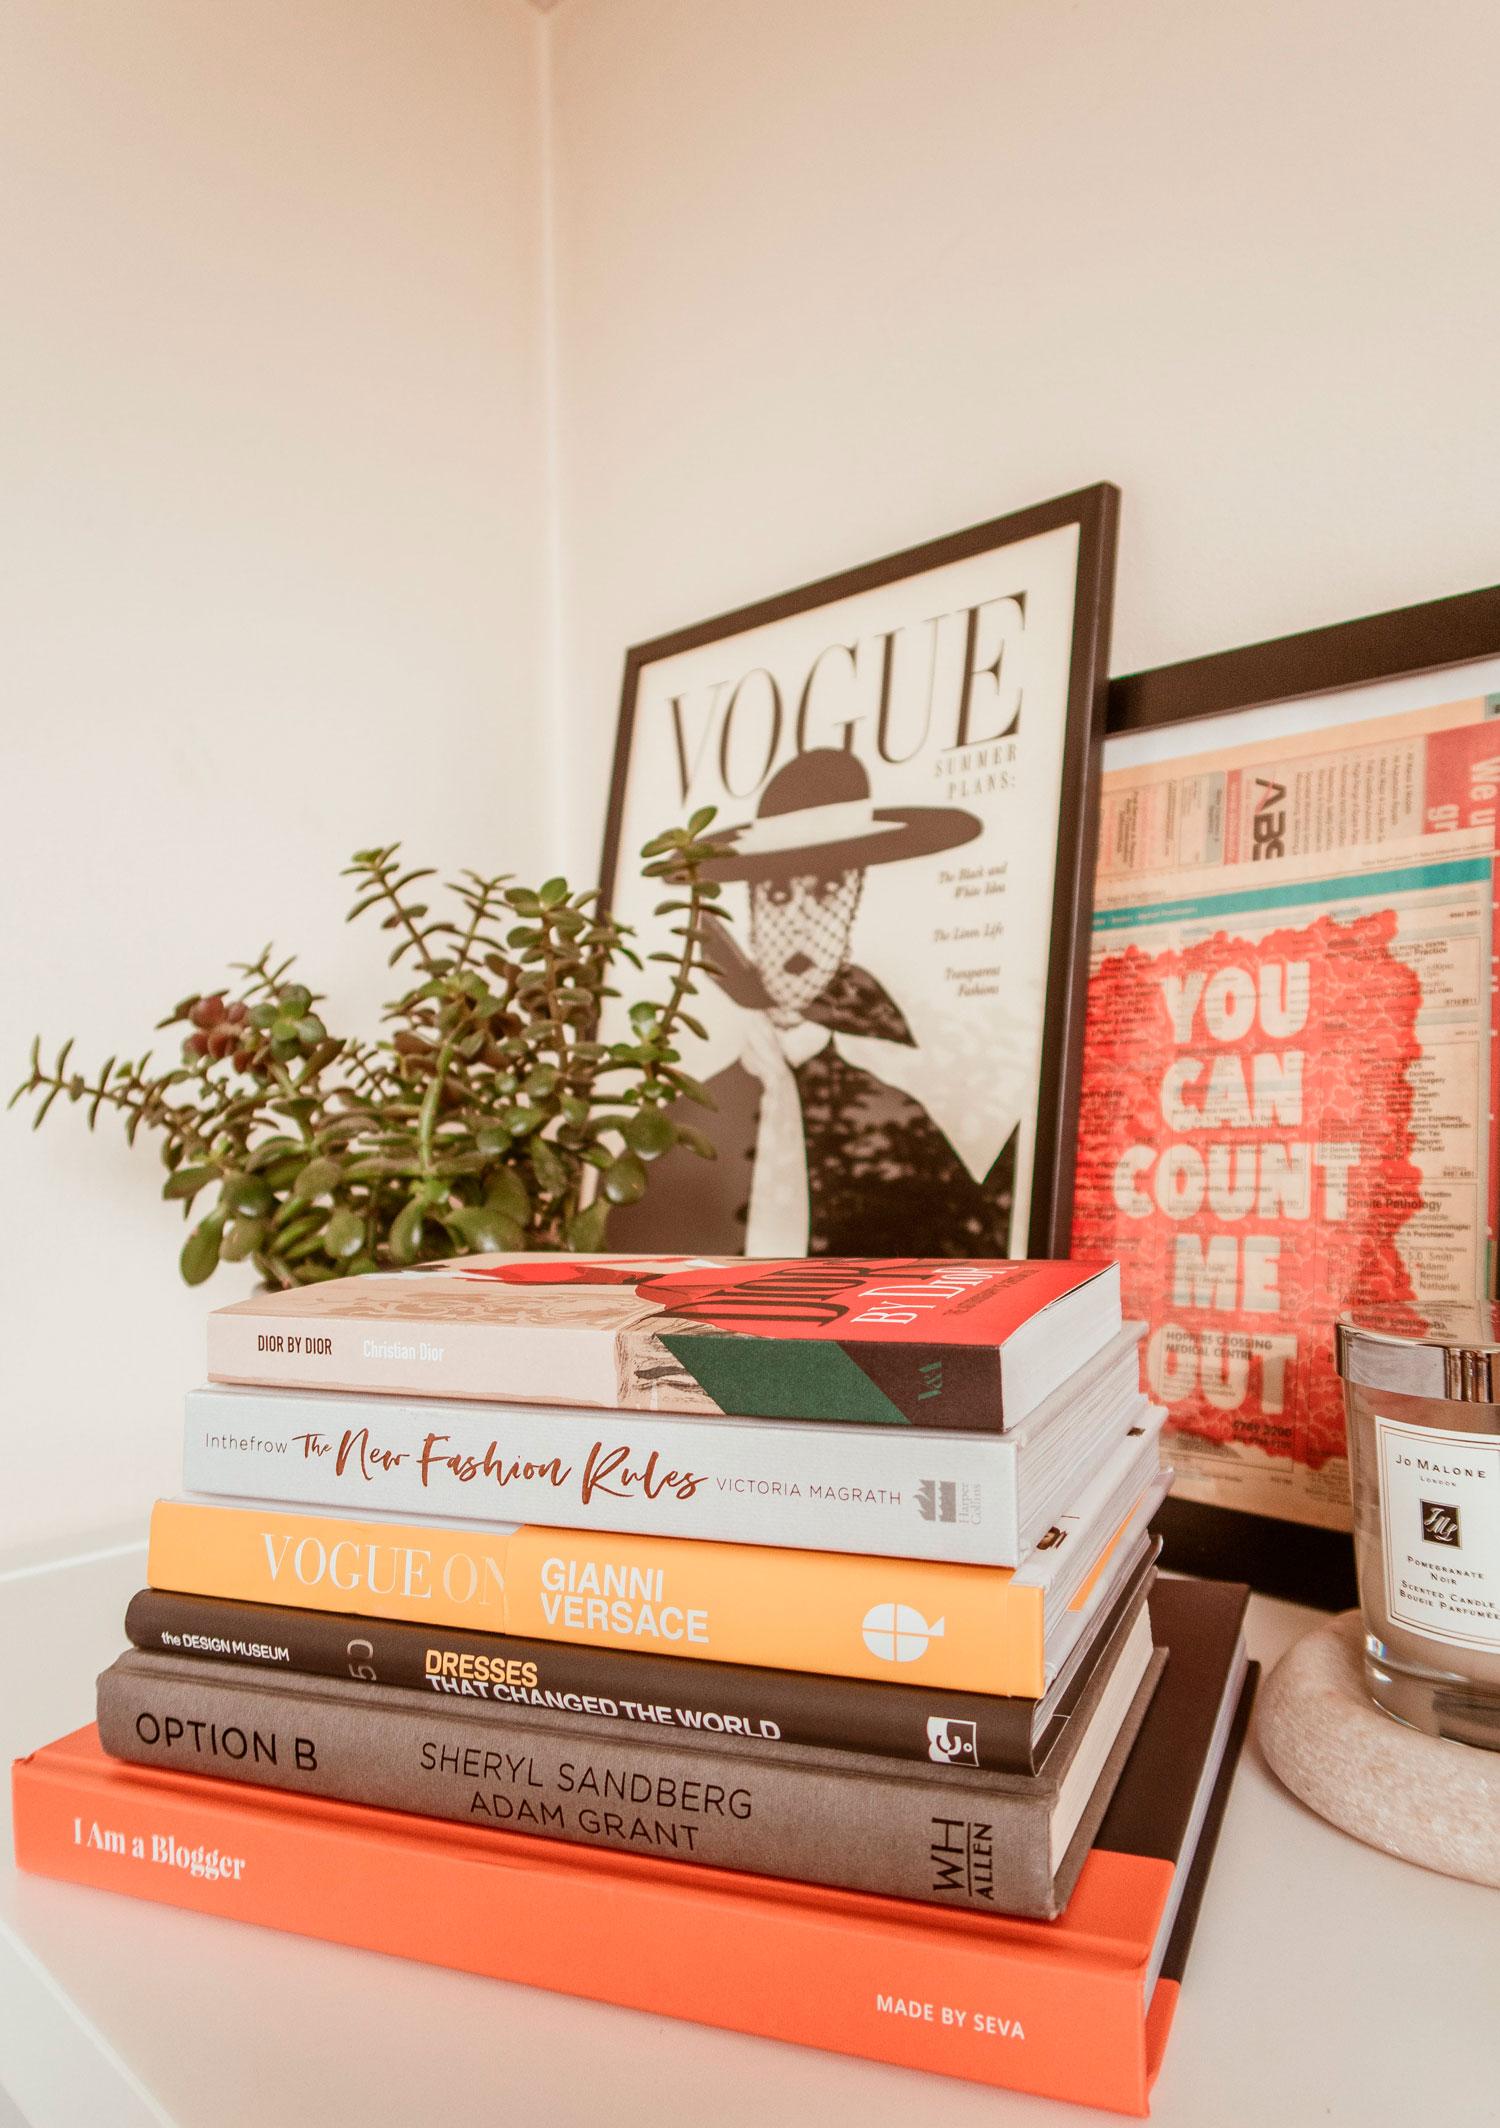 Marketing and Fashion books